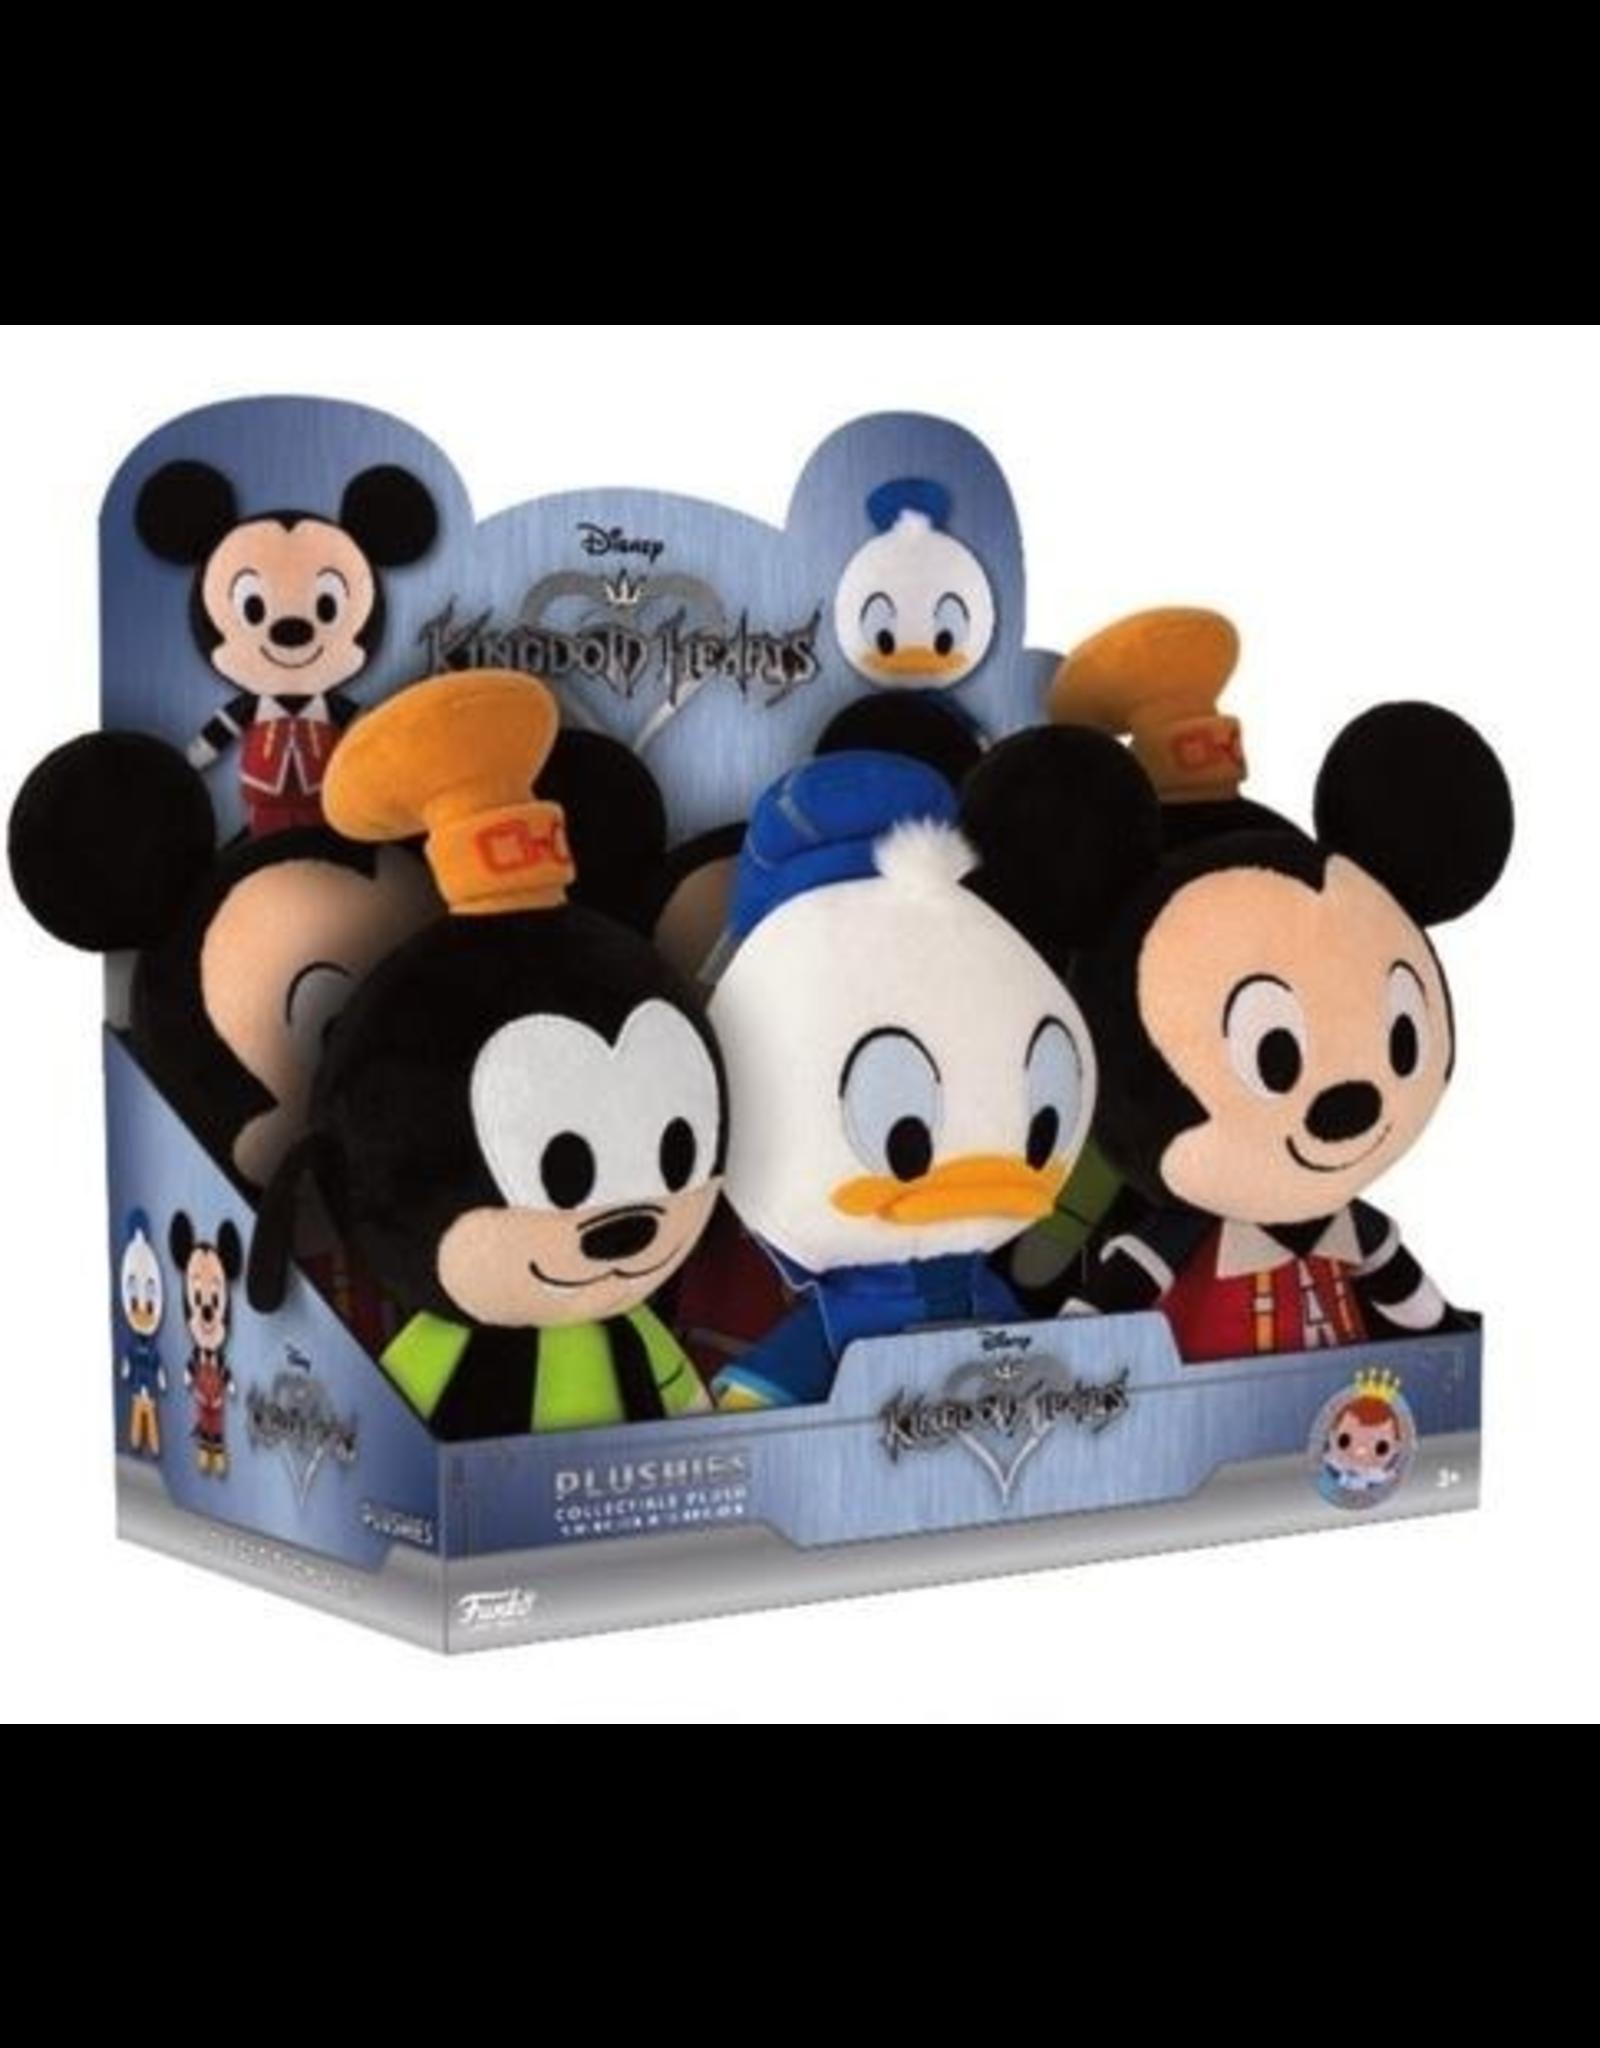 DISNEY - Kingdom Hearts Plush18cm - Goofy